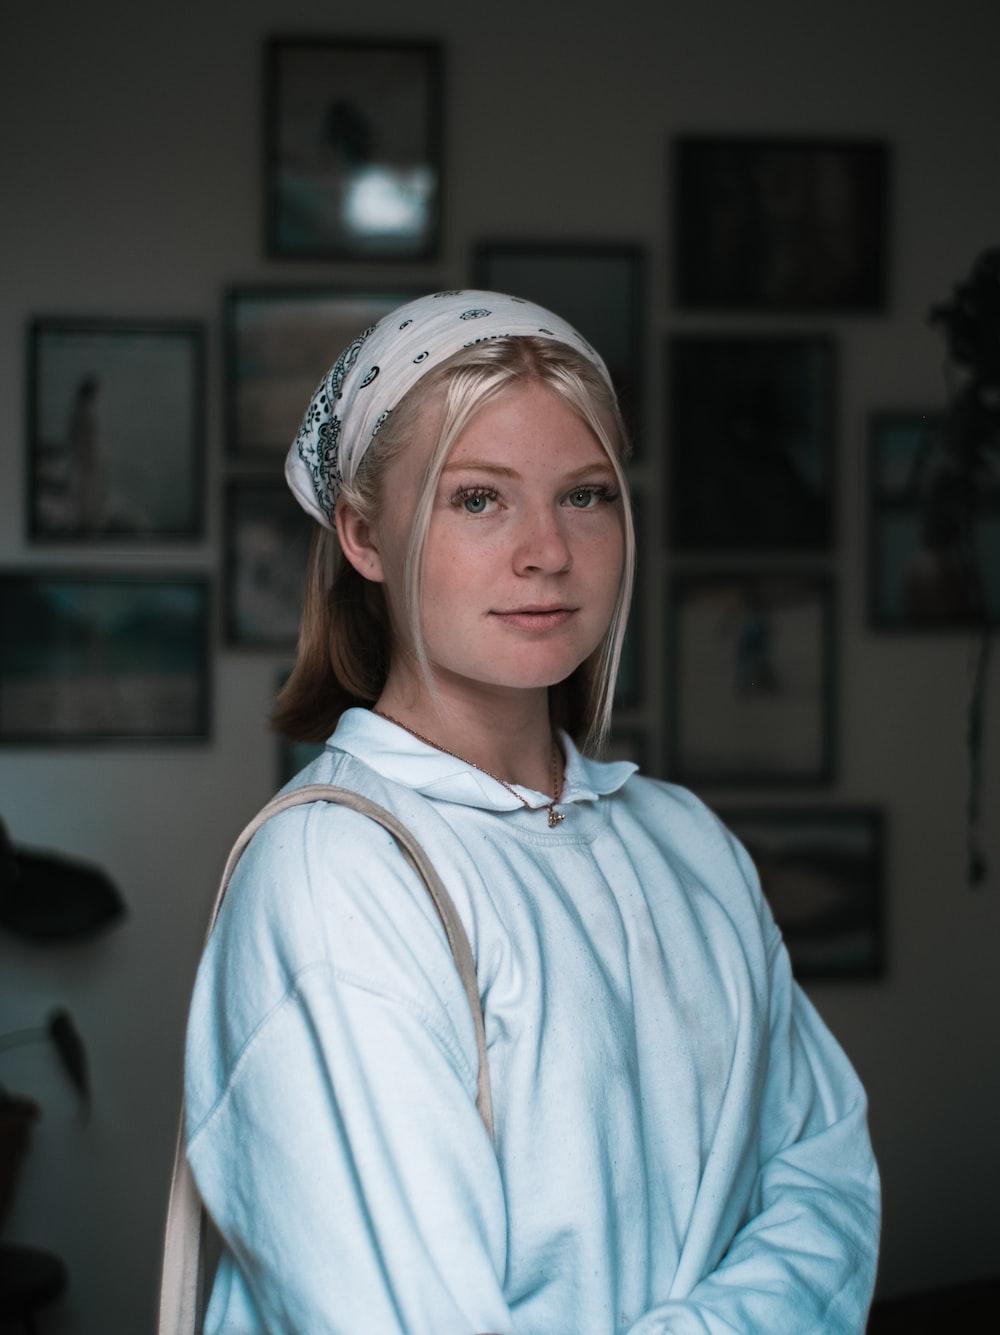 woman in white shirt wearing white head band